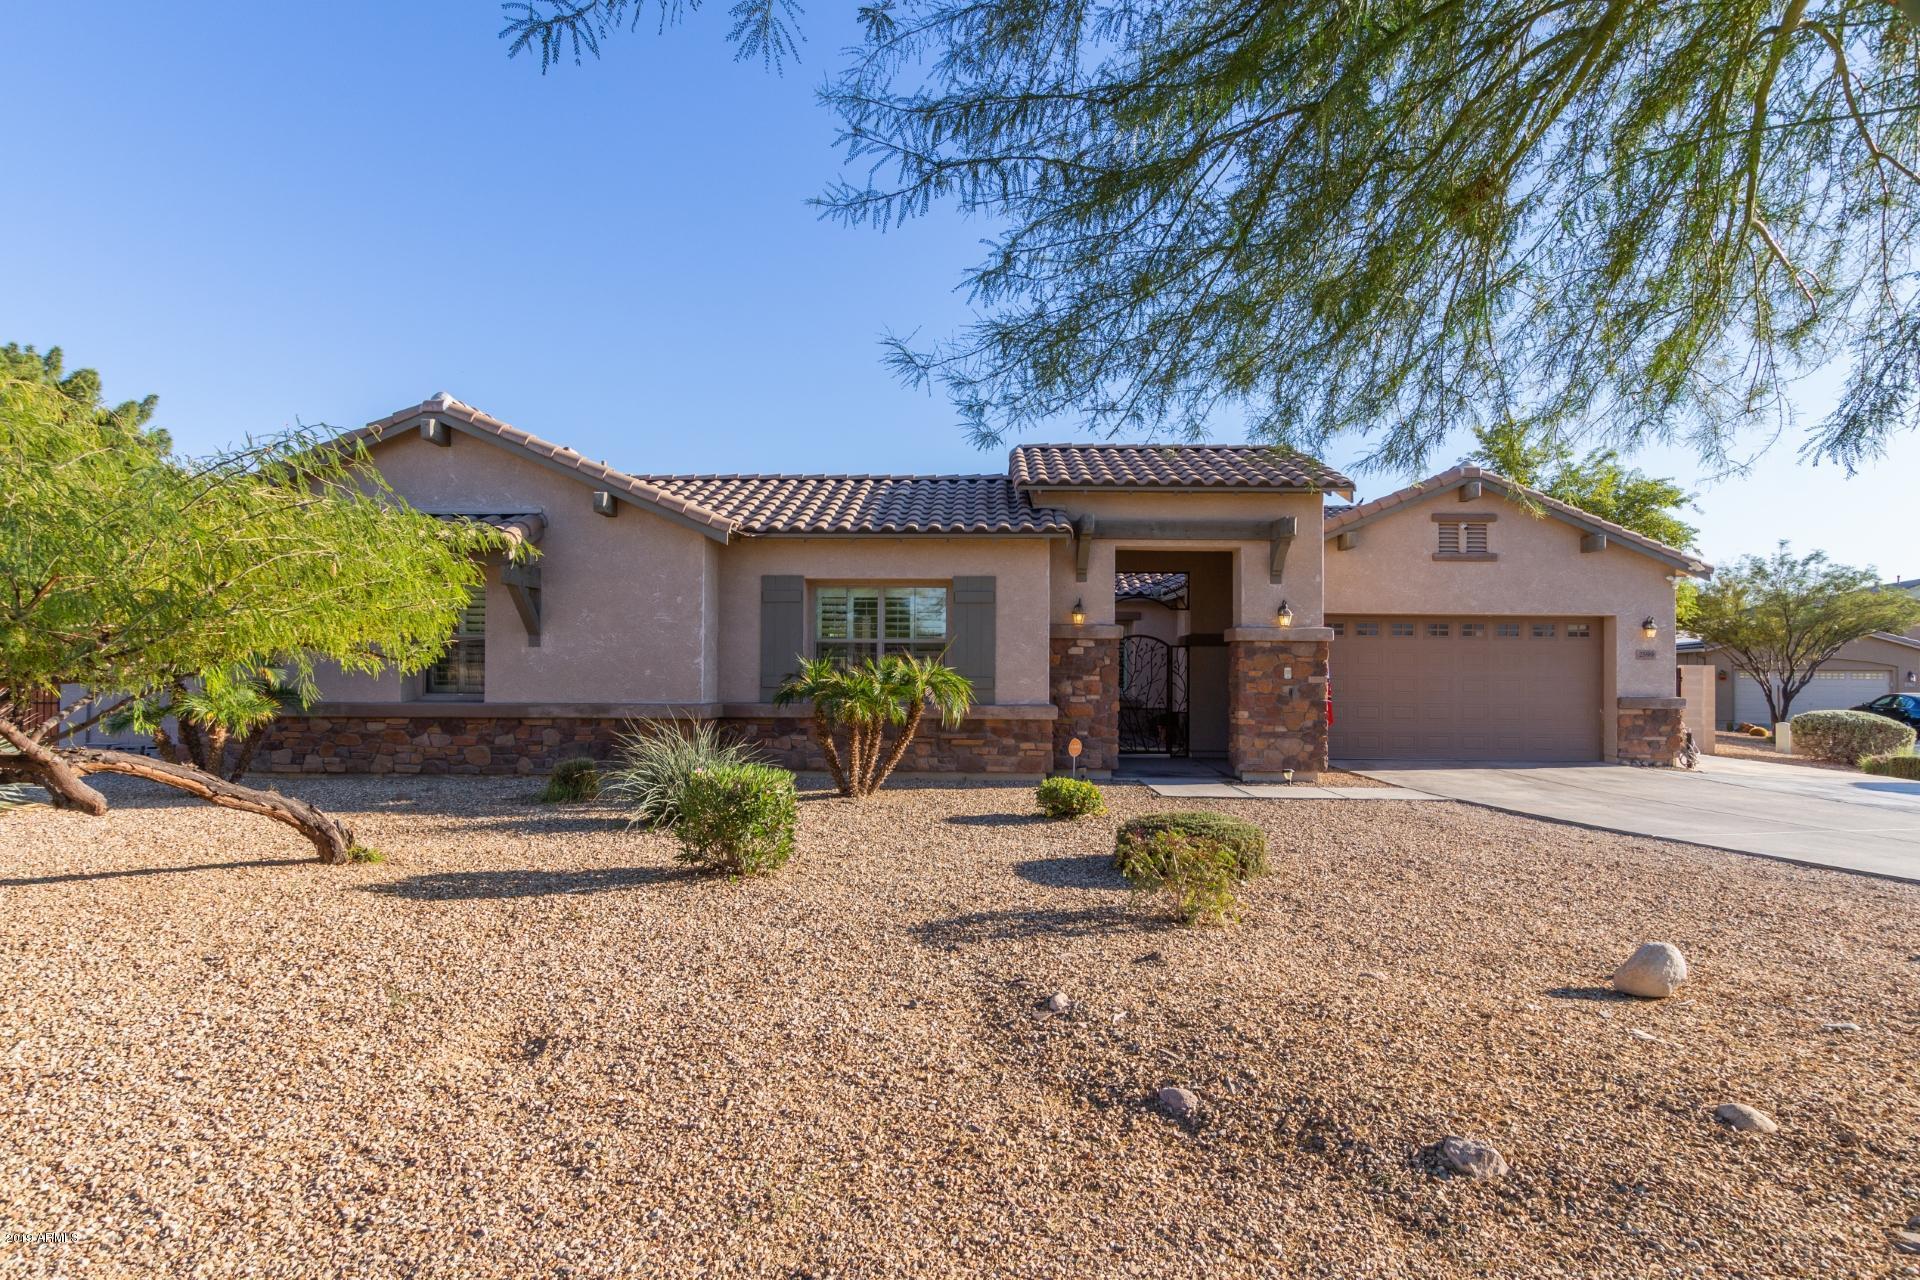 Photo of 2599 S 167TH Drive, Goodyear, AZ 85338